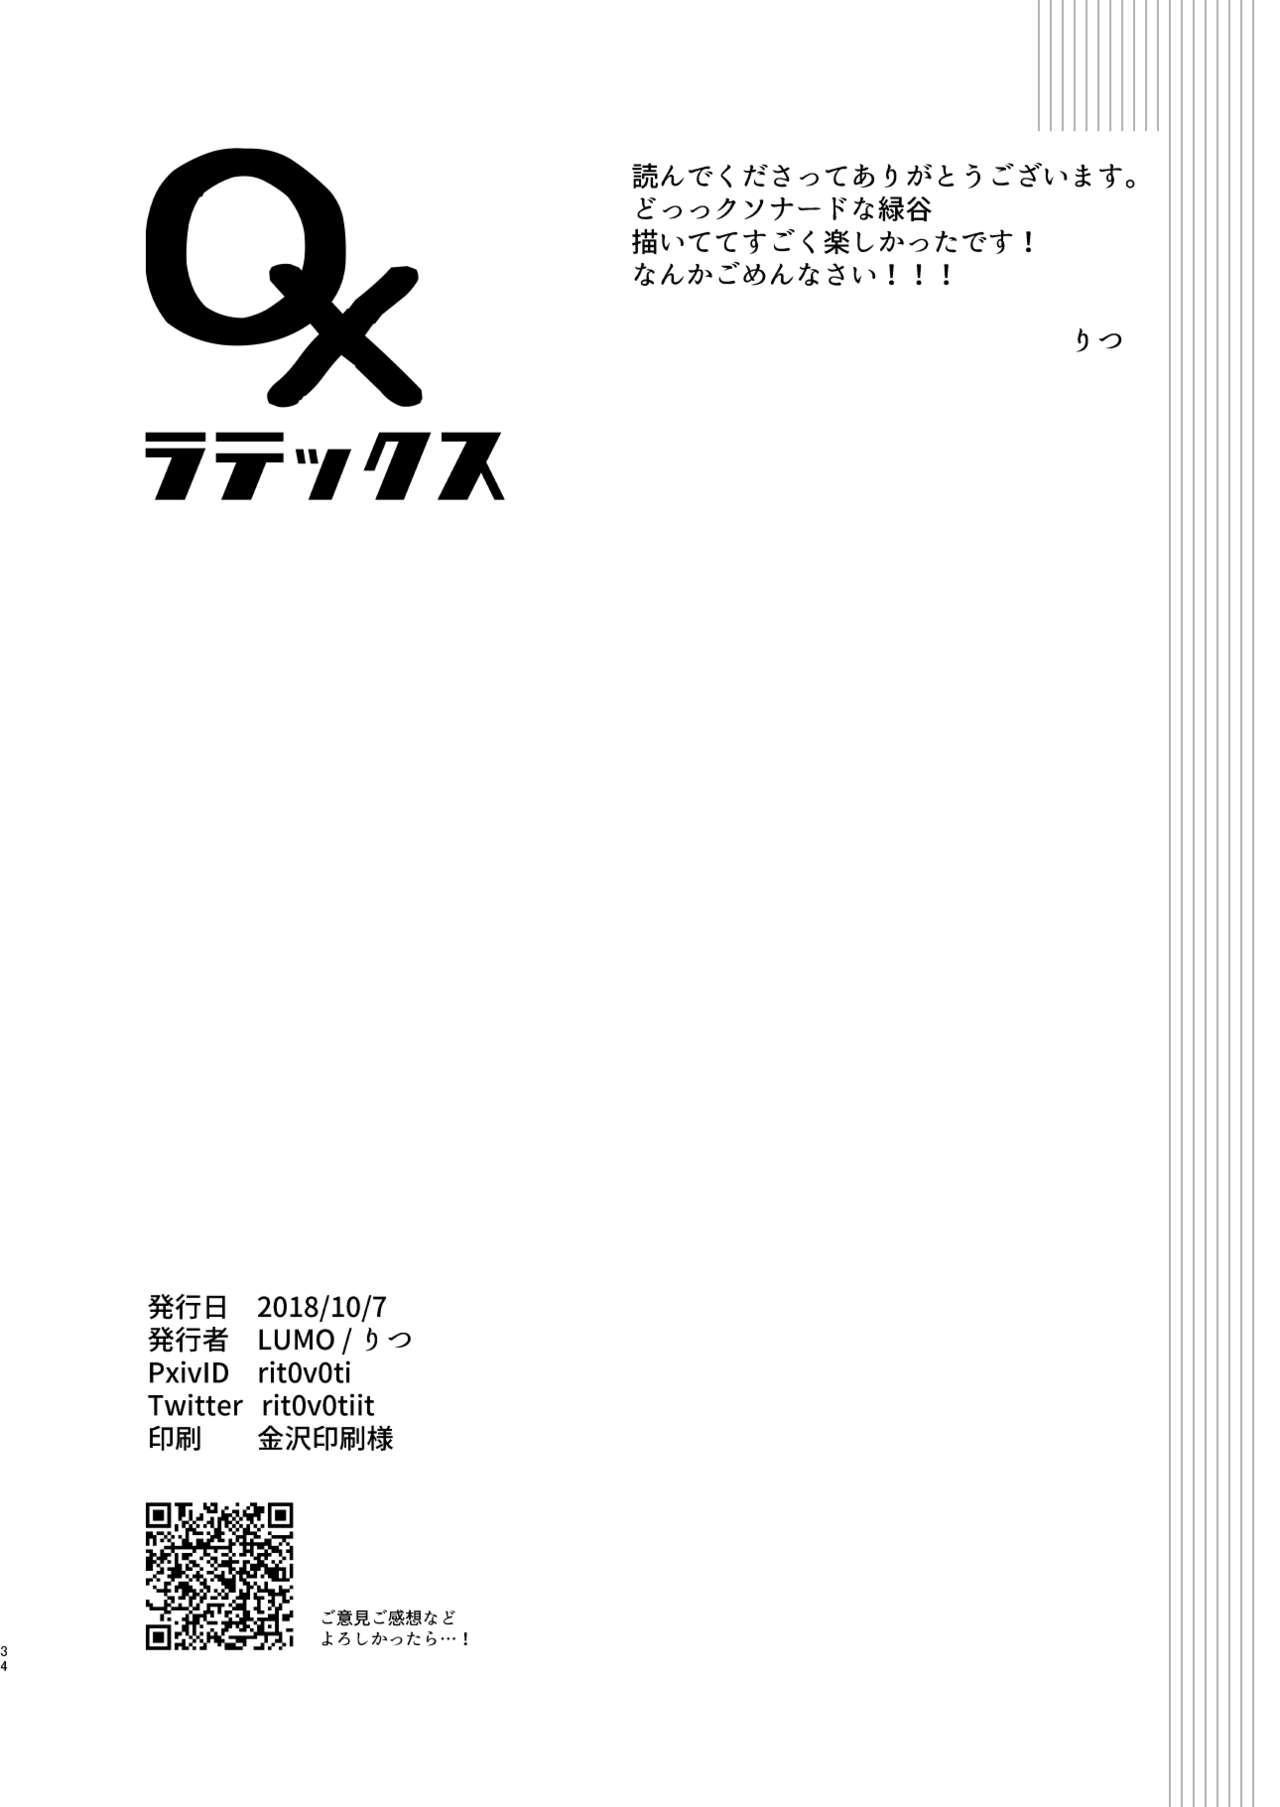 Marubatsu Latex 27